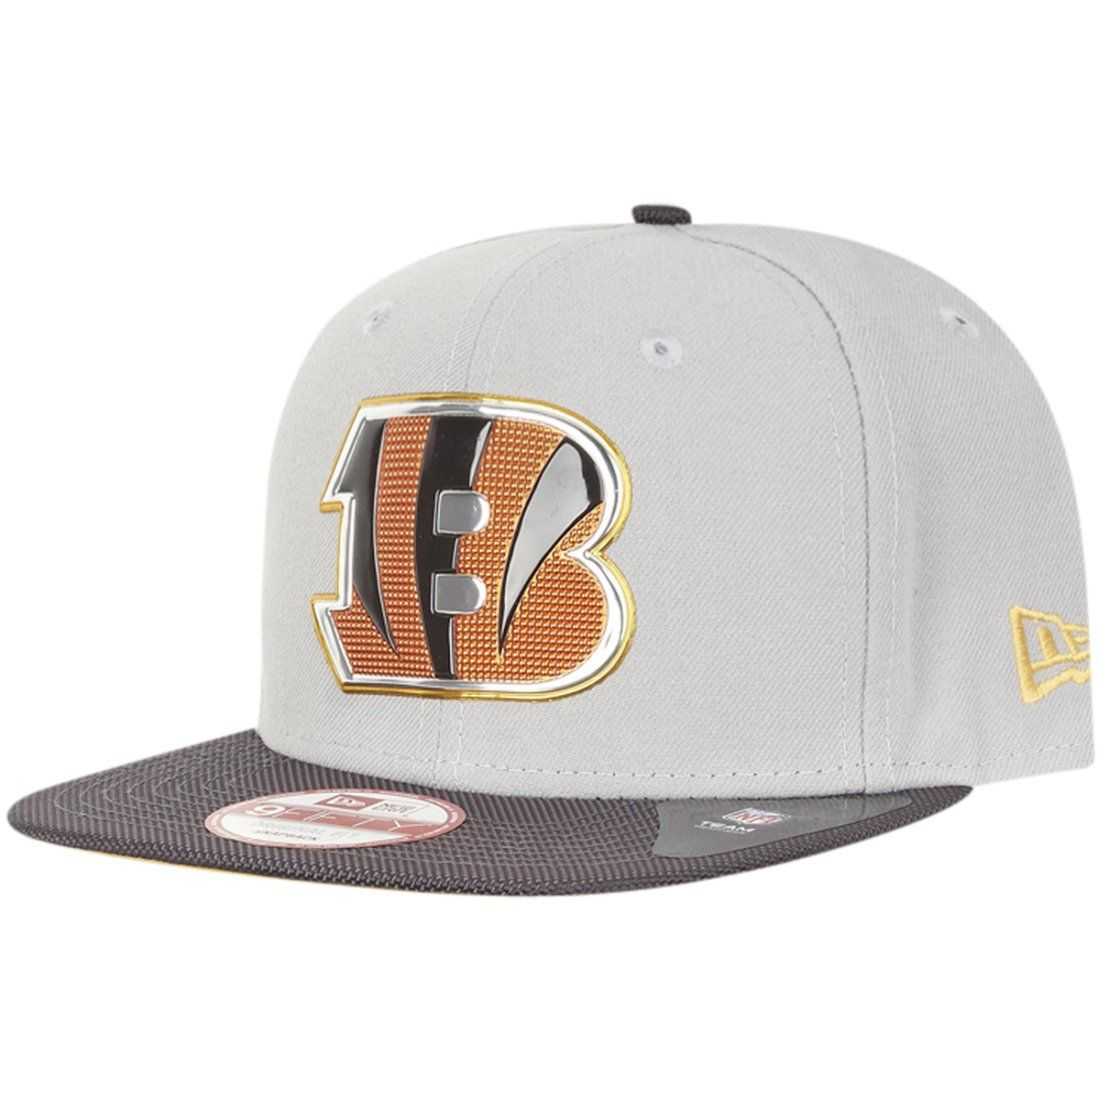 amfoo - New Era Snapback Cap - GOLD COLLECTION Cincinnati Bengals